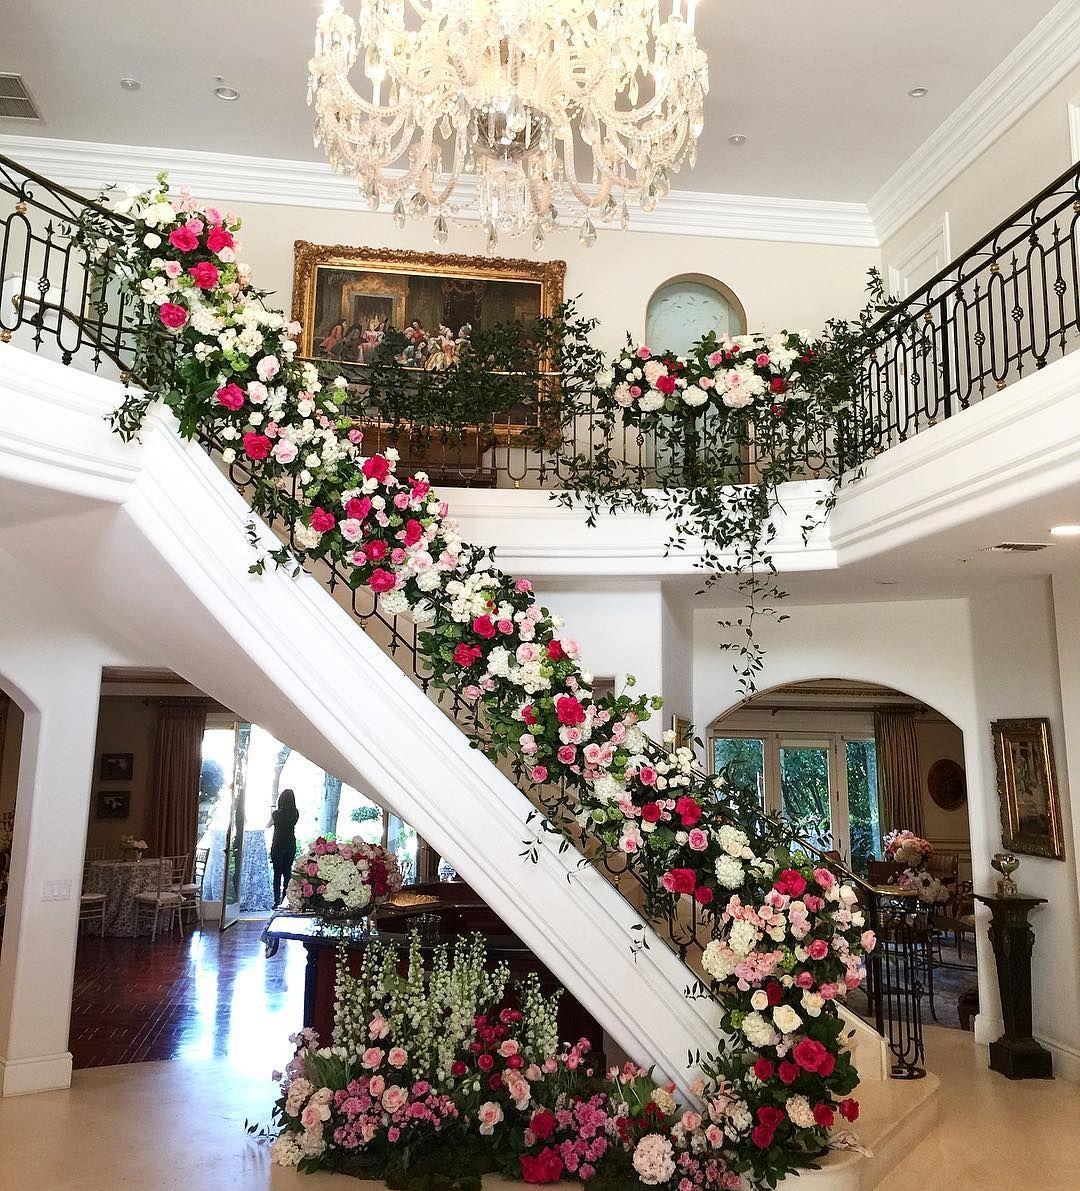 The Hidden Garden | Floral wedding decorations, Wedding staircase, Wedding  stairs